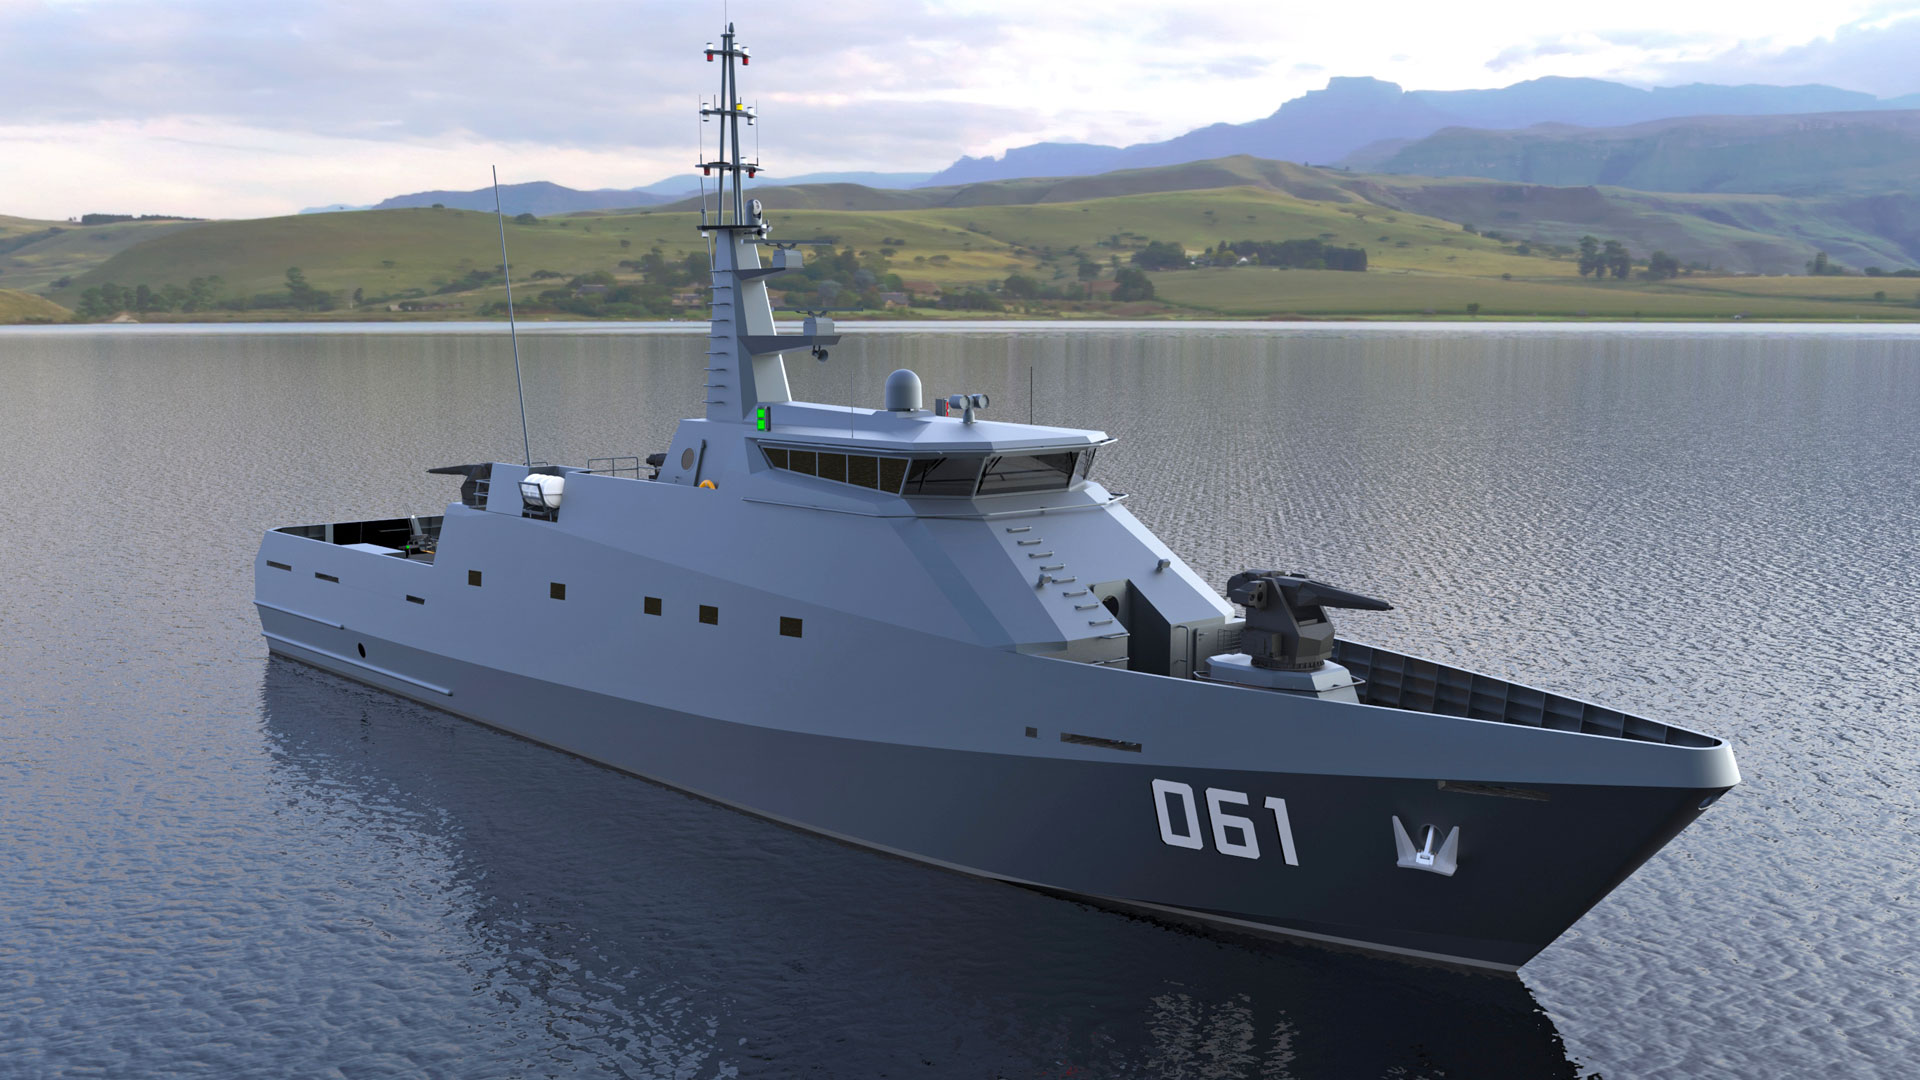 images/vessels/01-patrol-craft/05-series-fpb/01-ares-138-fpb/1_1620642470.jpg